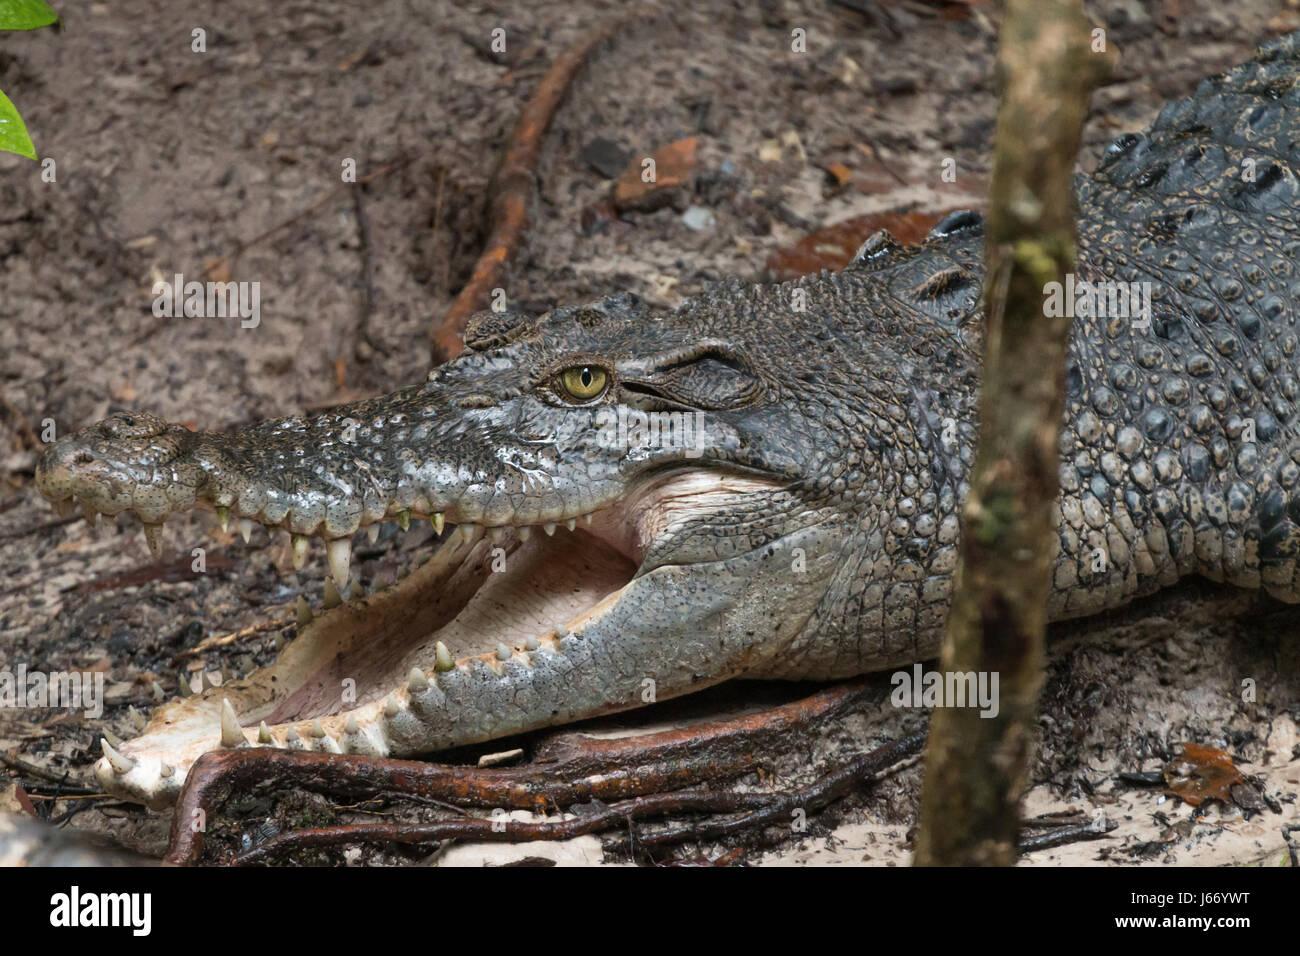 Saltwater crocodile (Crocodylus porosus) lies basking in Sungei Buloh Wetland Reserve in Singapore - Stock Image